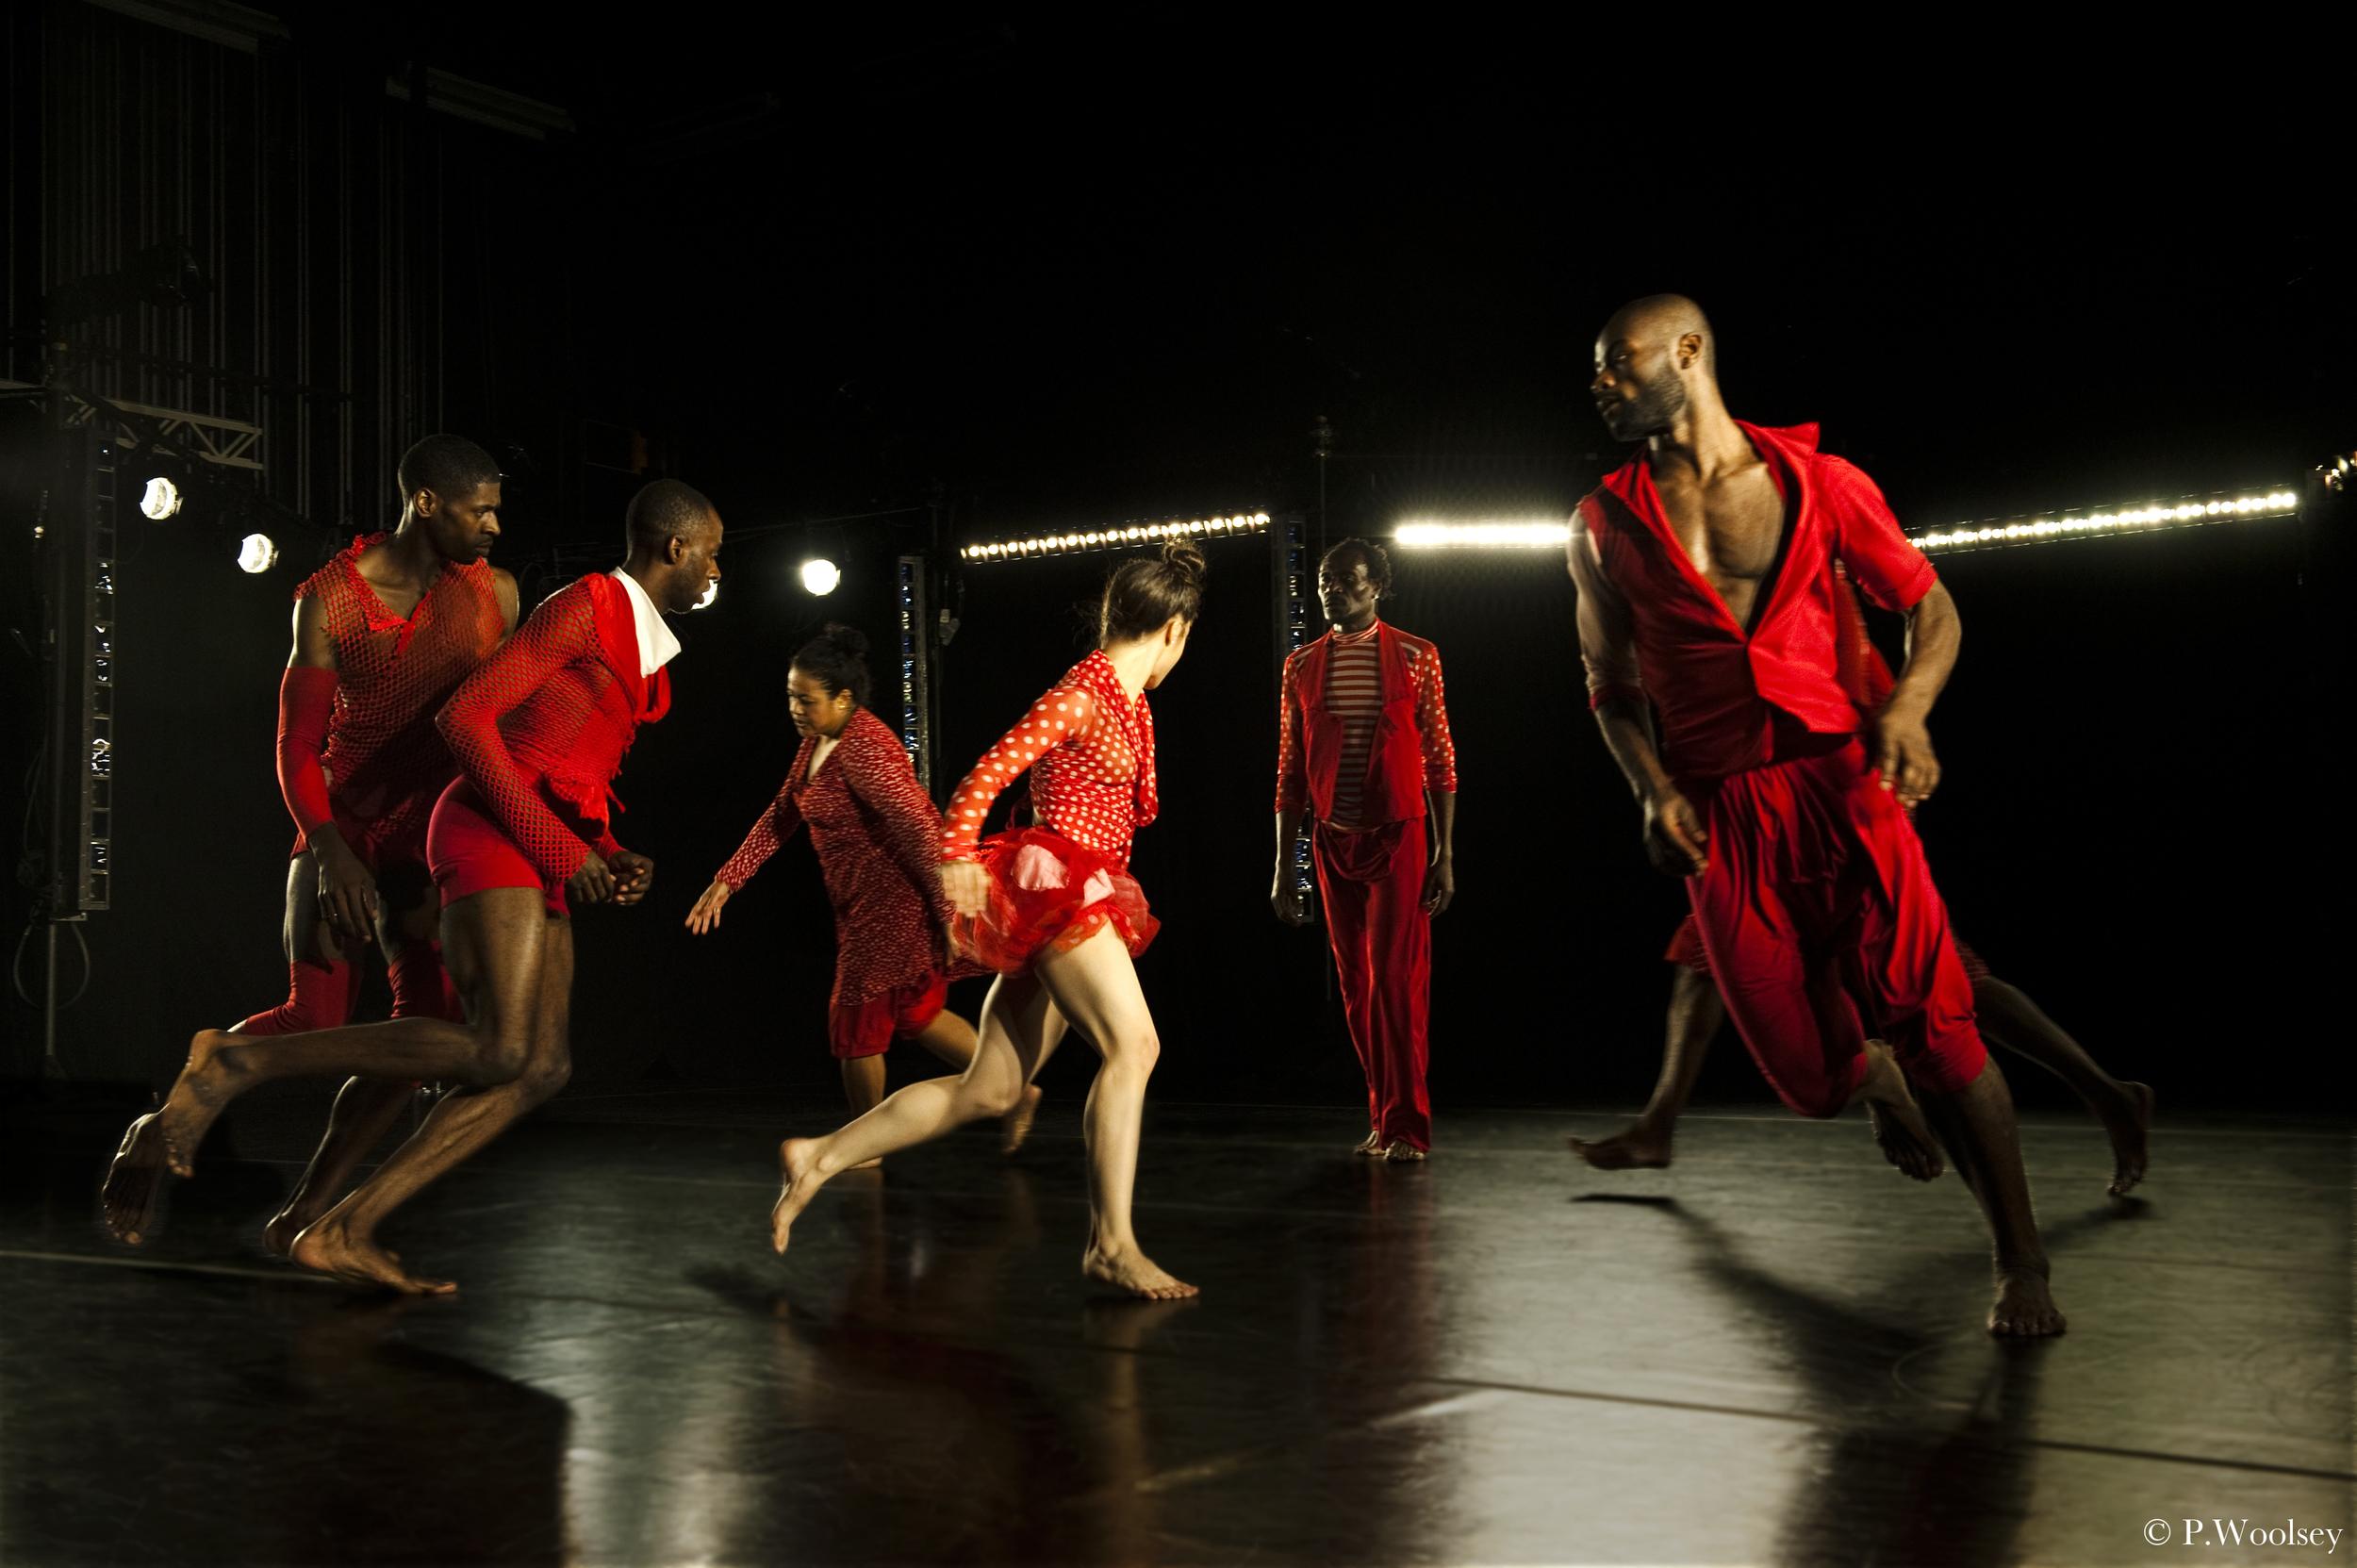 Photo Peggy Woolsey_dancersAnna Schön, Raja Feather Kelly, Dwayne Brown, Rhetta Aleong, Lawrence Harding, Paul Hamilton, Clement Mensah.jpg